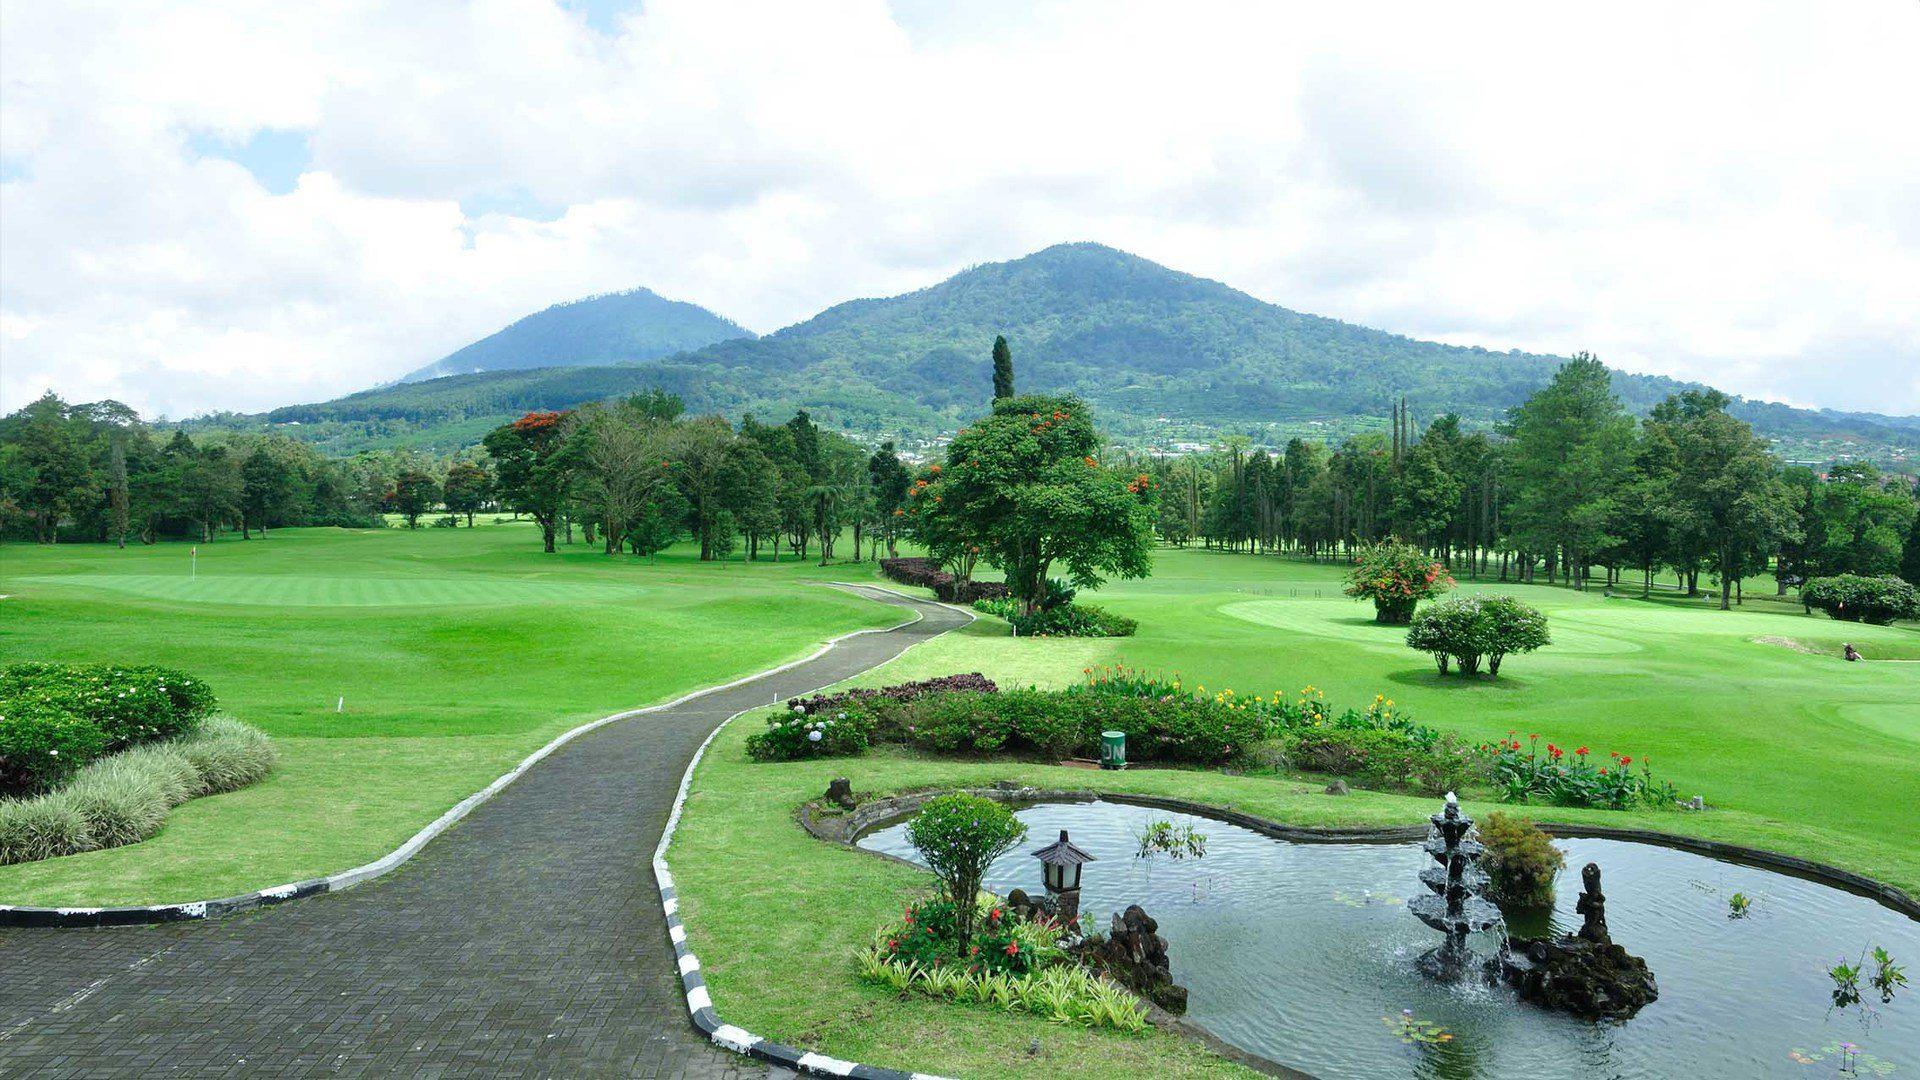 На фото гольф-поля Хандара